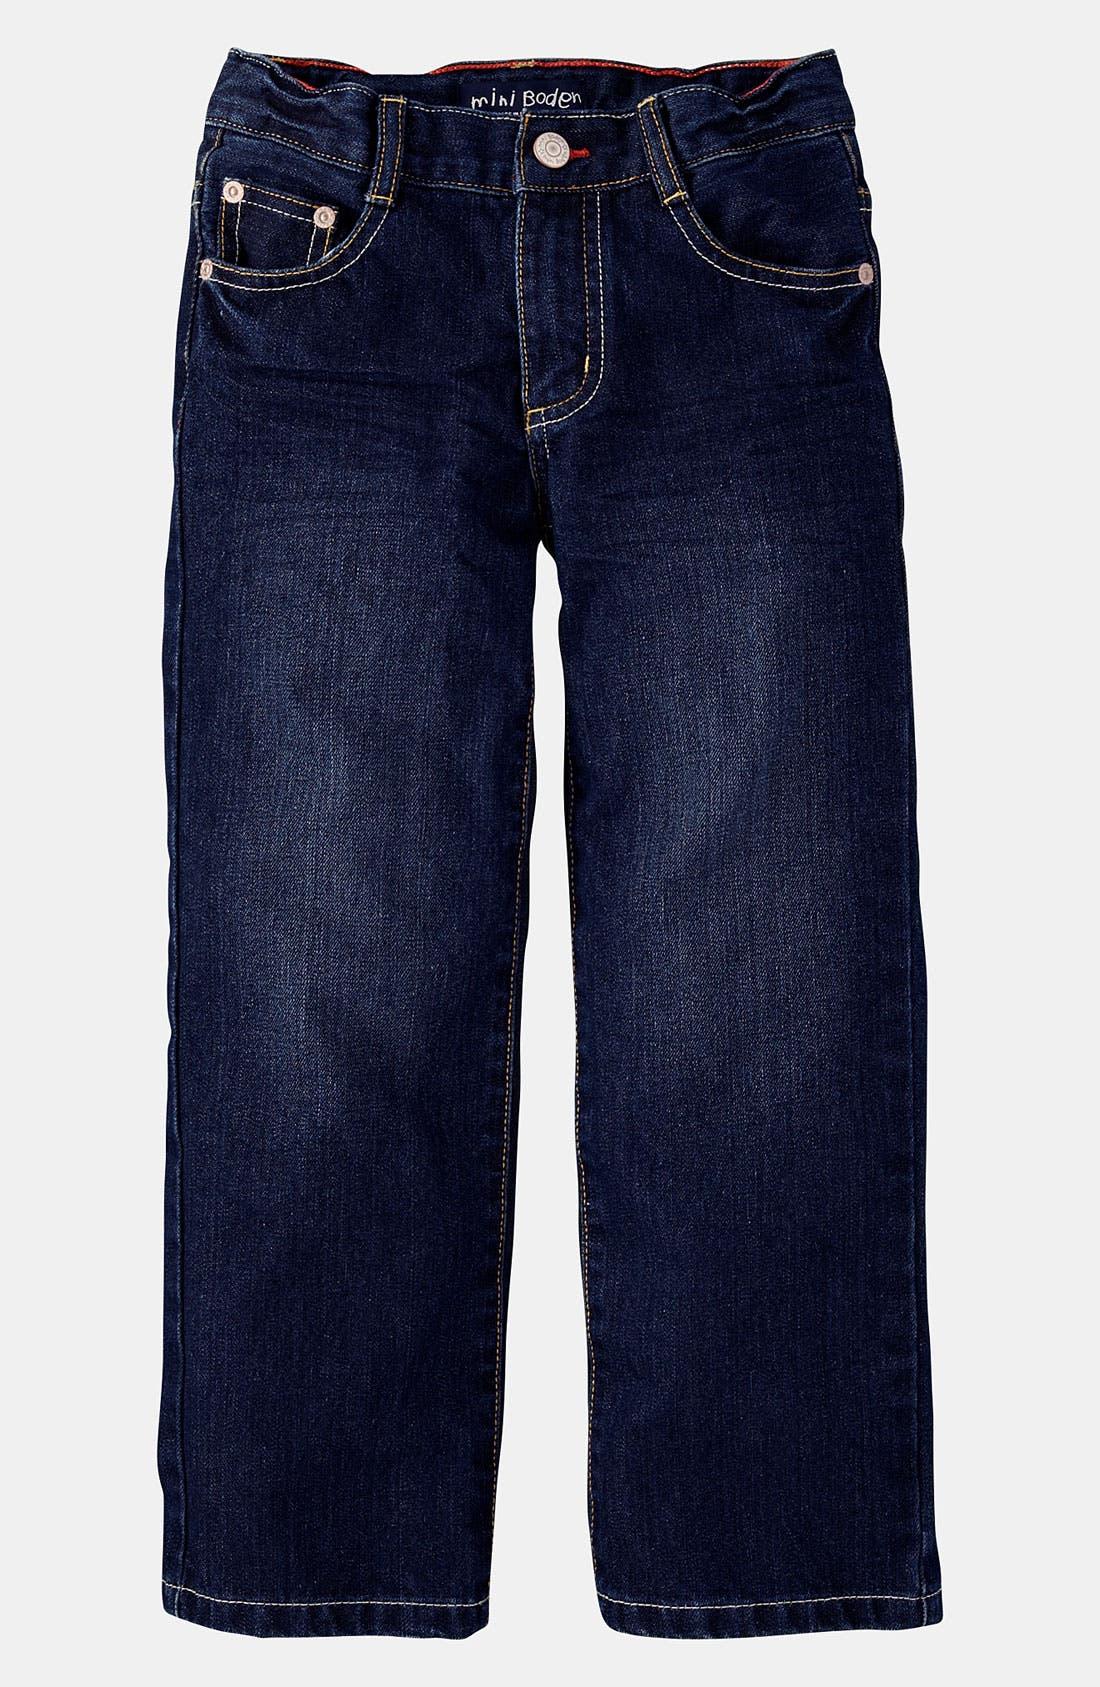 Alternate Image 1 Selected - Mini Boden Regular Fit Jeans (Little Boys & Big Boys)